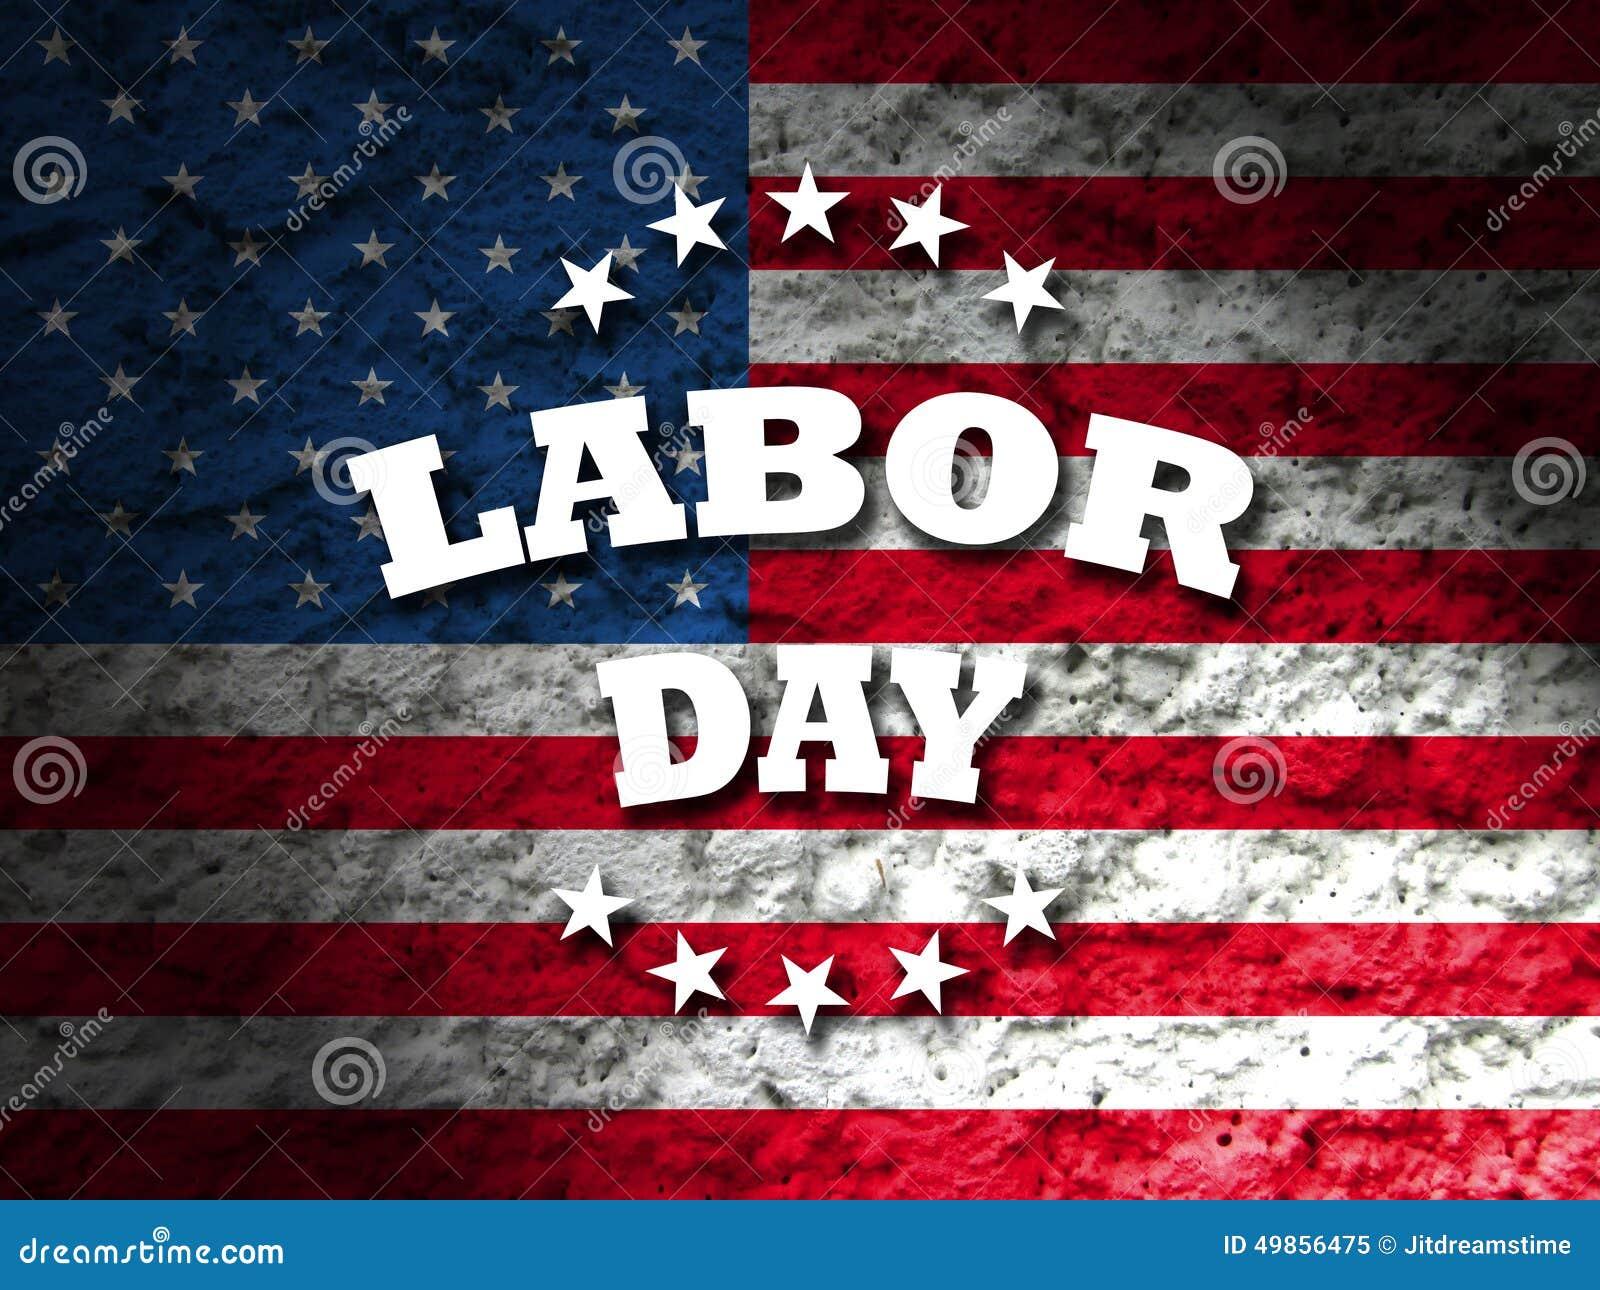 Labor day stock image image of grunge america labor 49856475 download labor day stock image image of grunge america labor 49856475 m4hsunfo